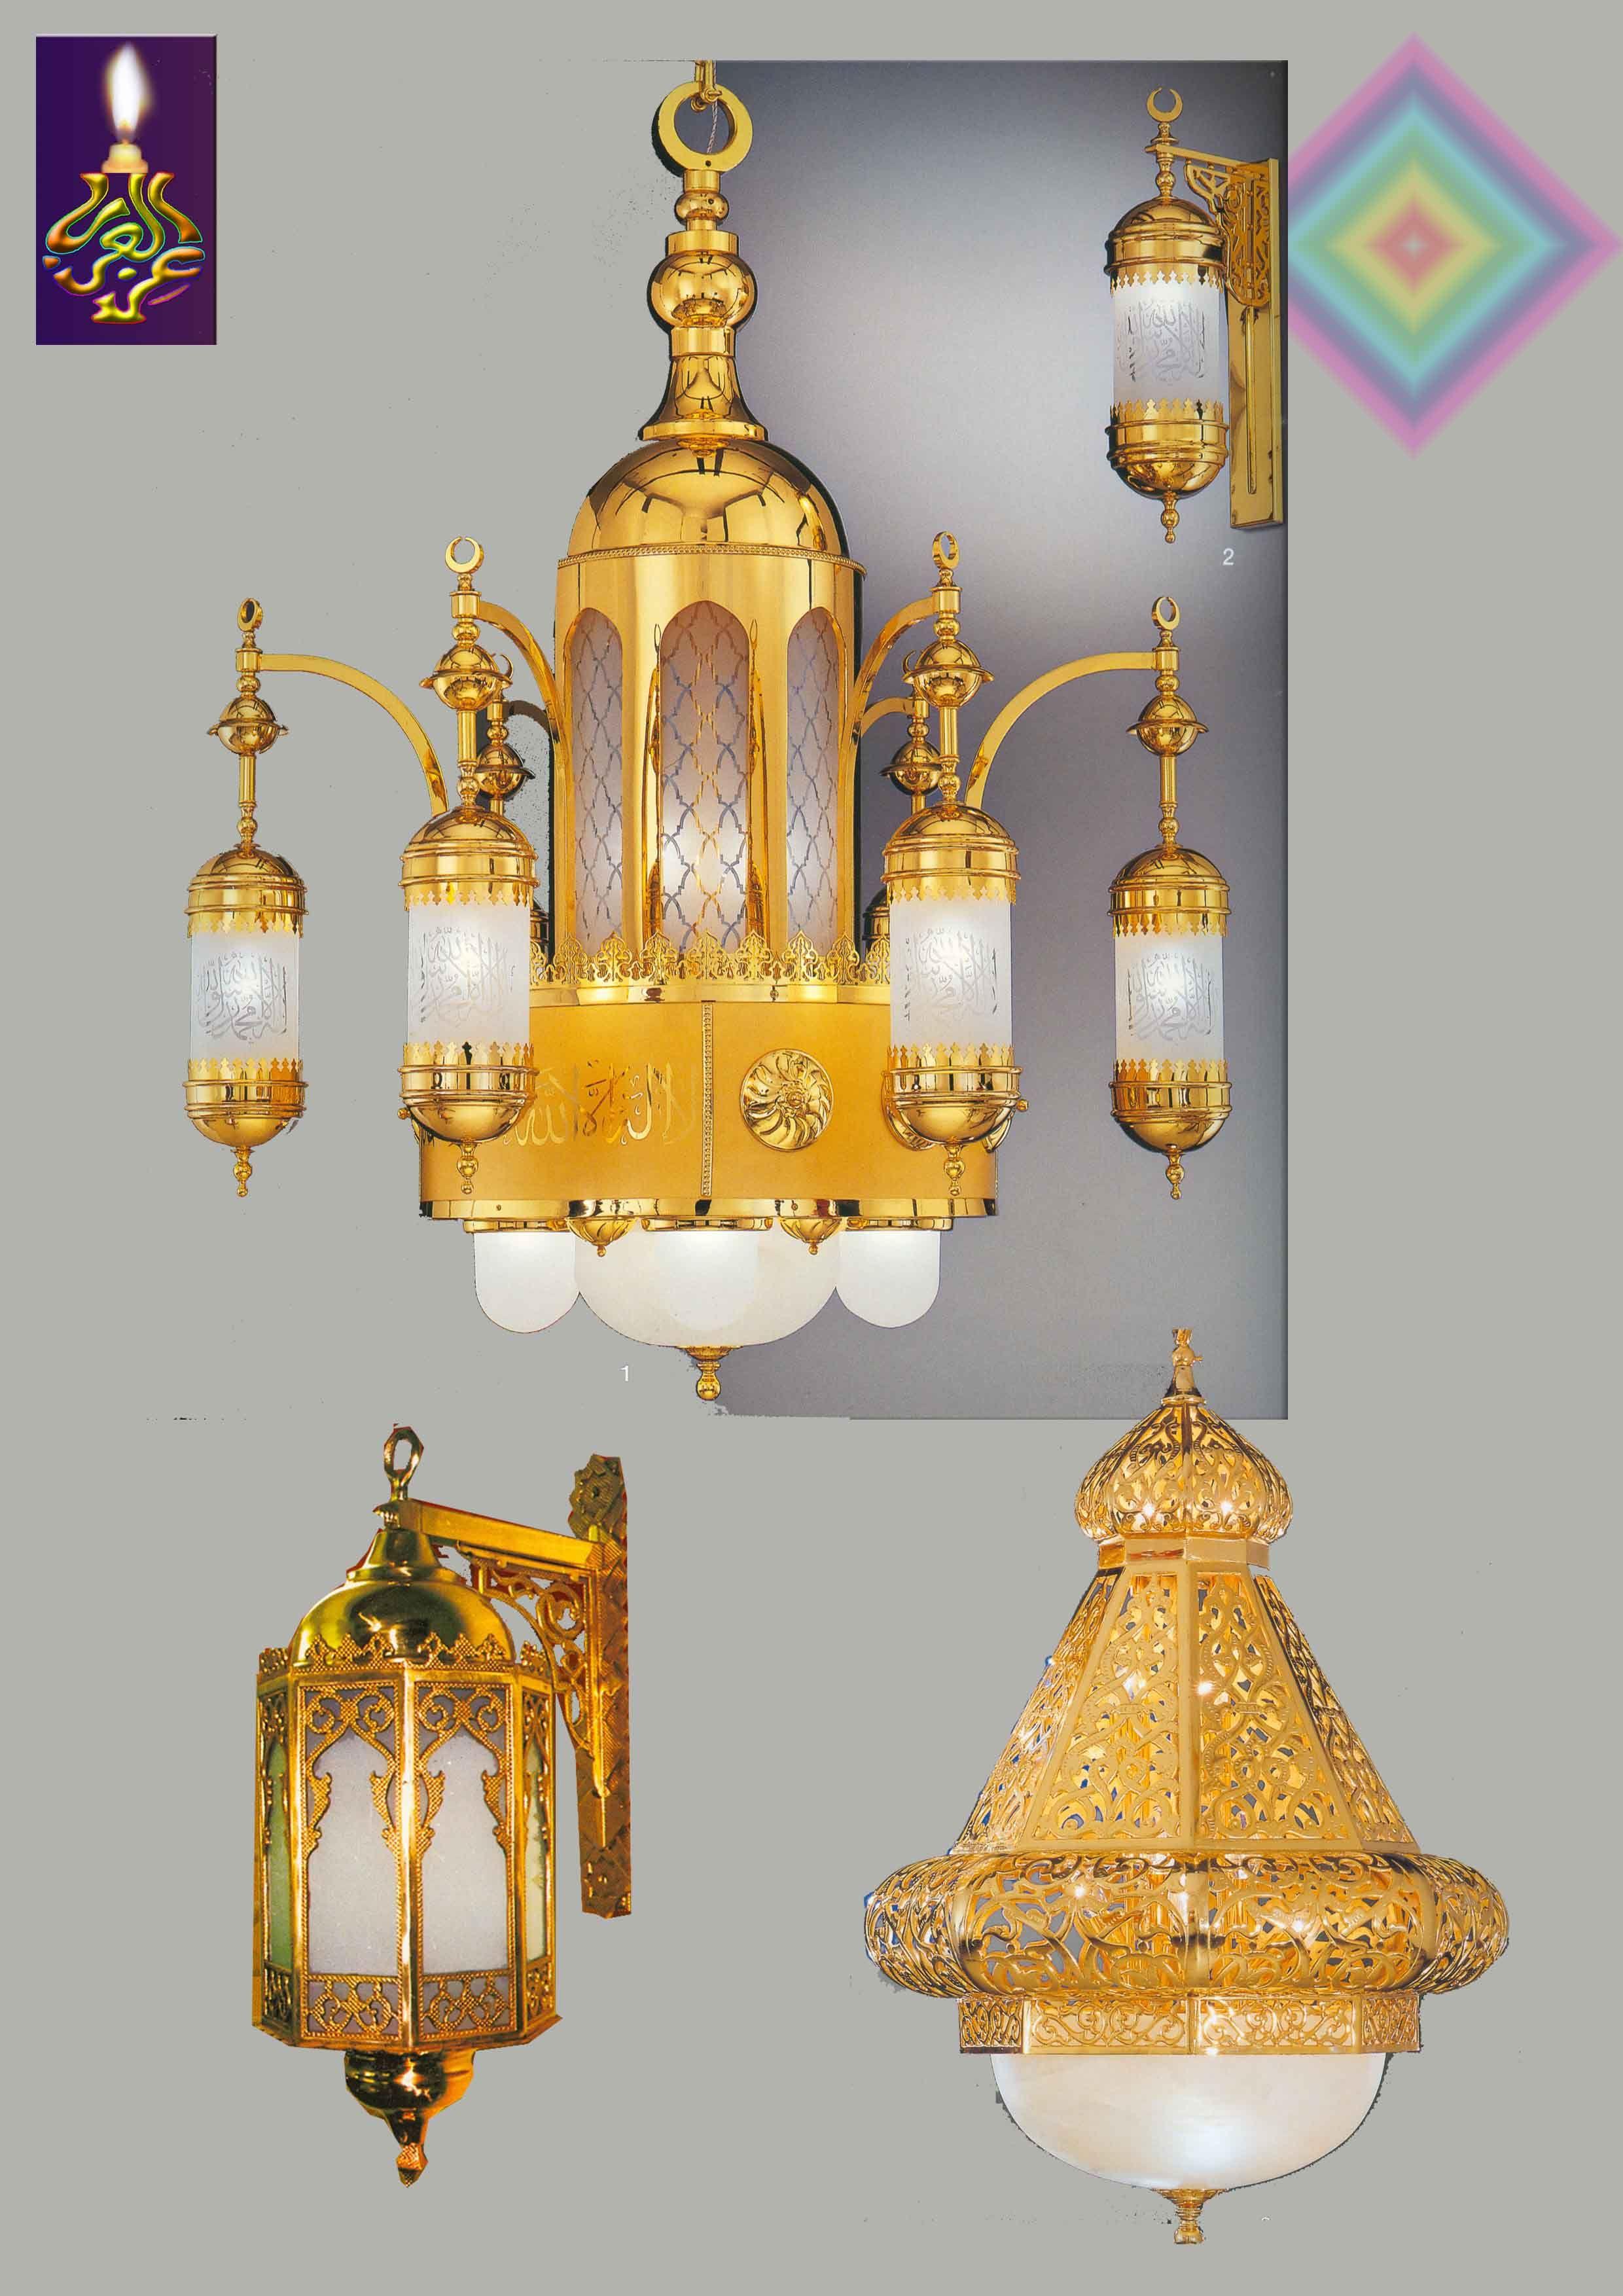 Pin By Ayman Ezzalarab Allam On نجف اسلامى Ceiling Lights Decor Chandelier